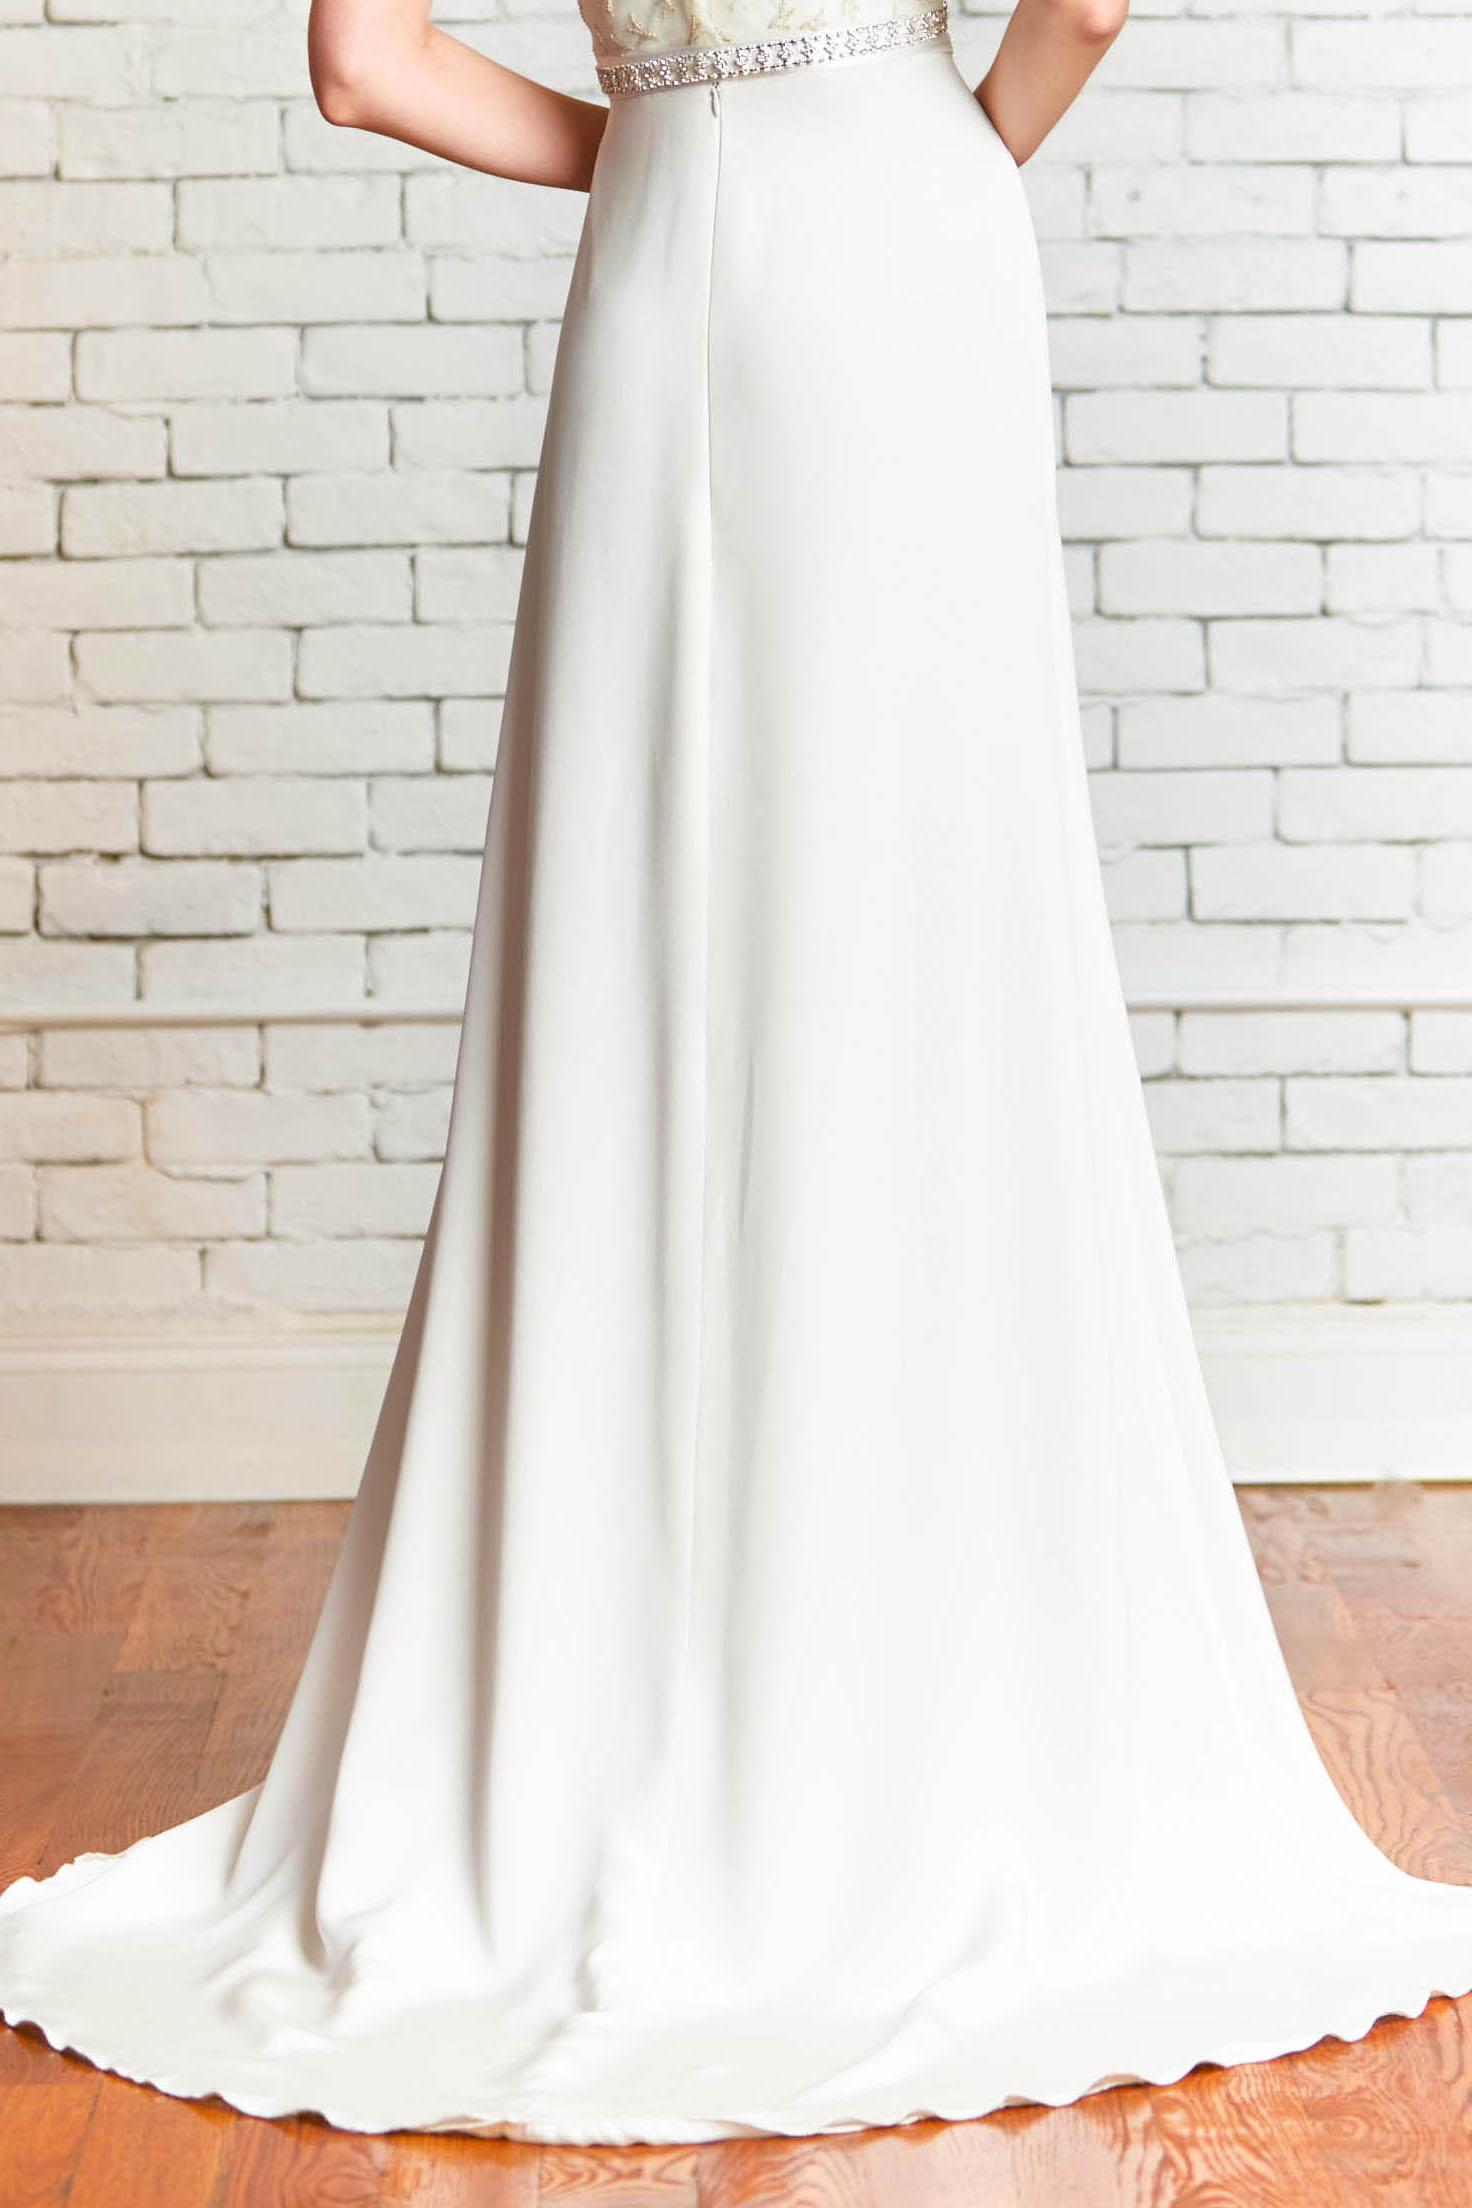 Aimee-back-skirt_Dramatic_Train_Modern_Wedding_Separates.jpg